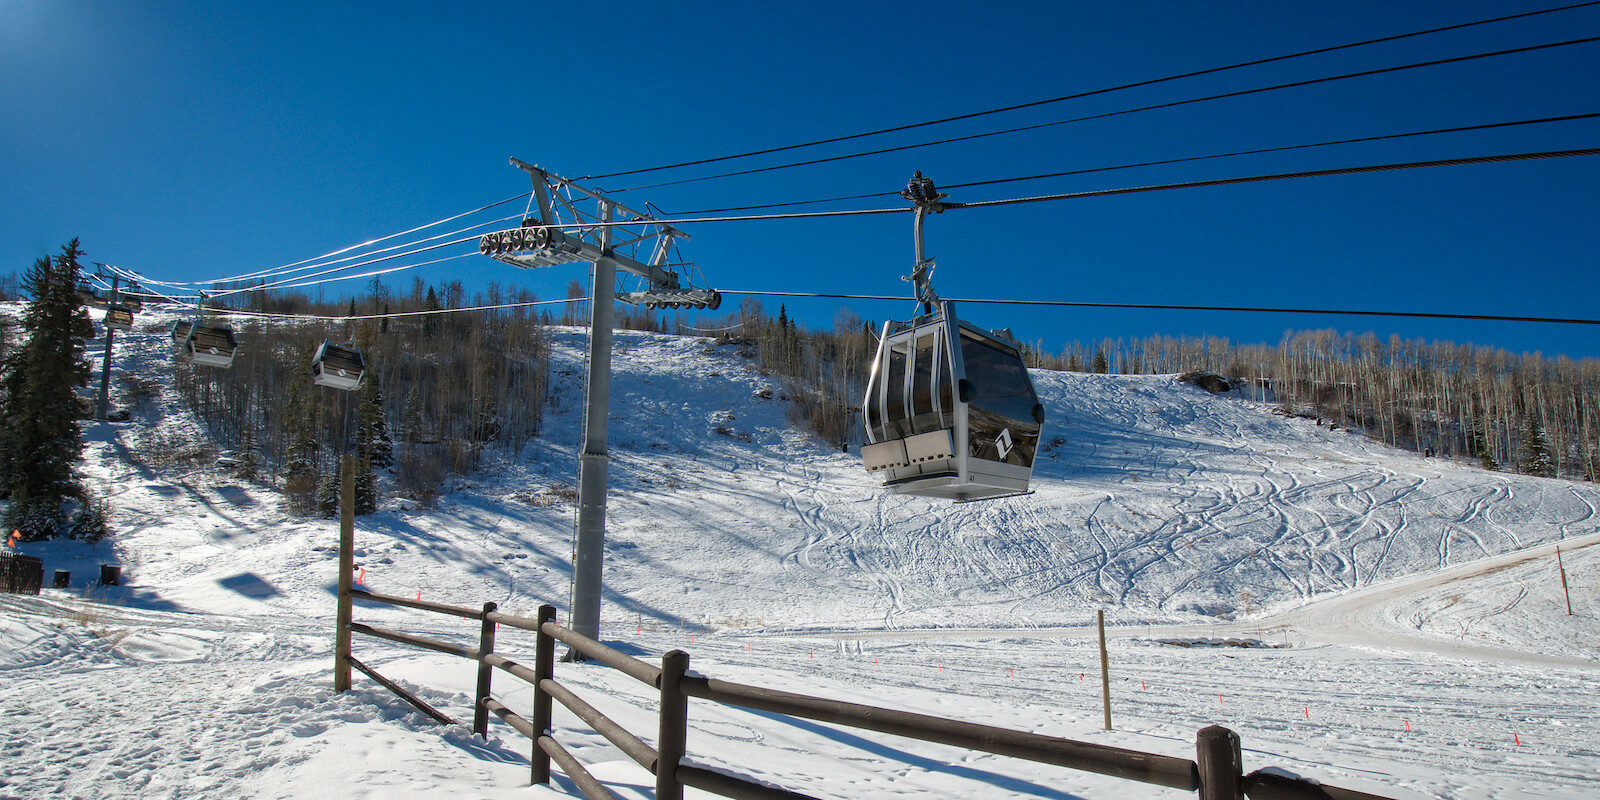 Image of the One Gondola in Vail, Colorado